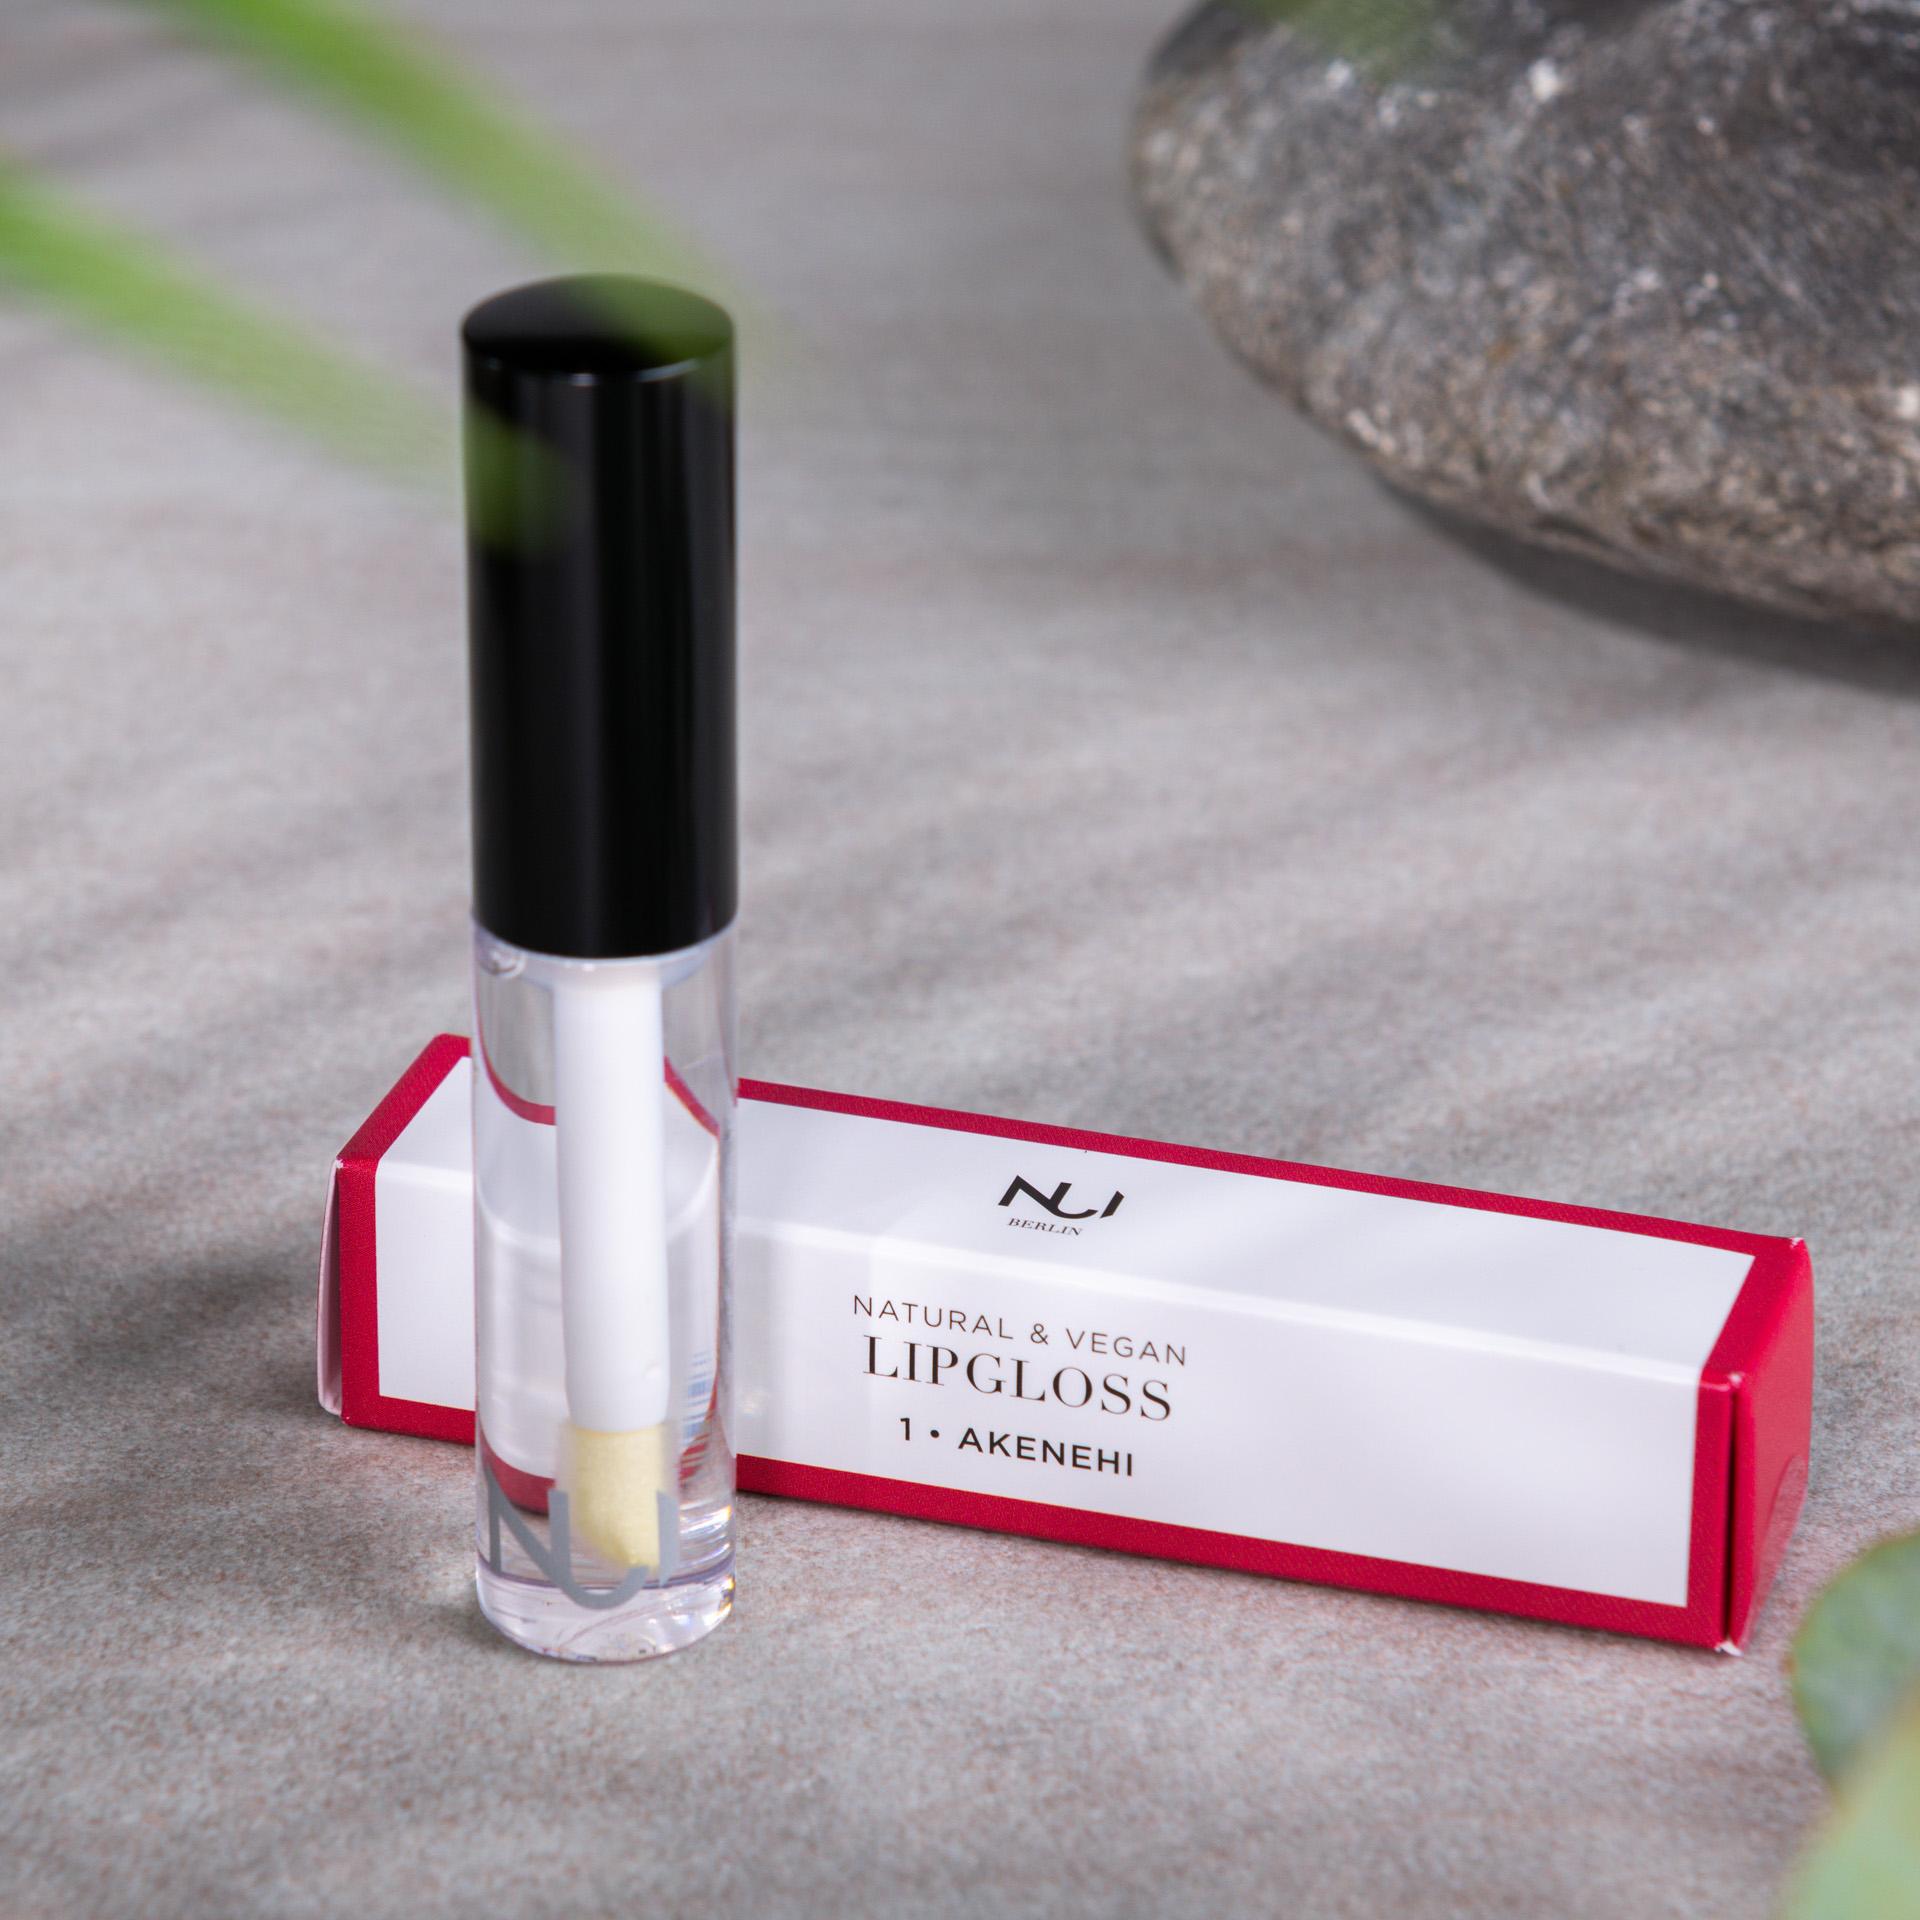 NUI Natural Lipgloss 1 AKENEHI